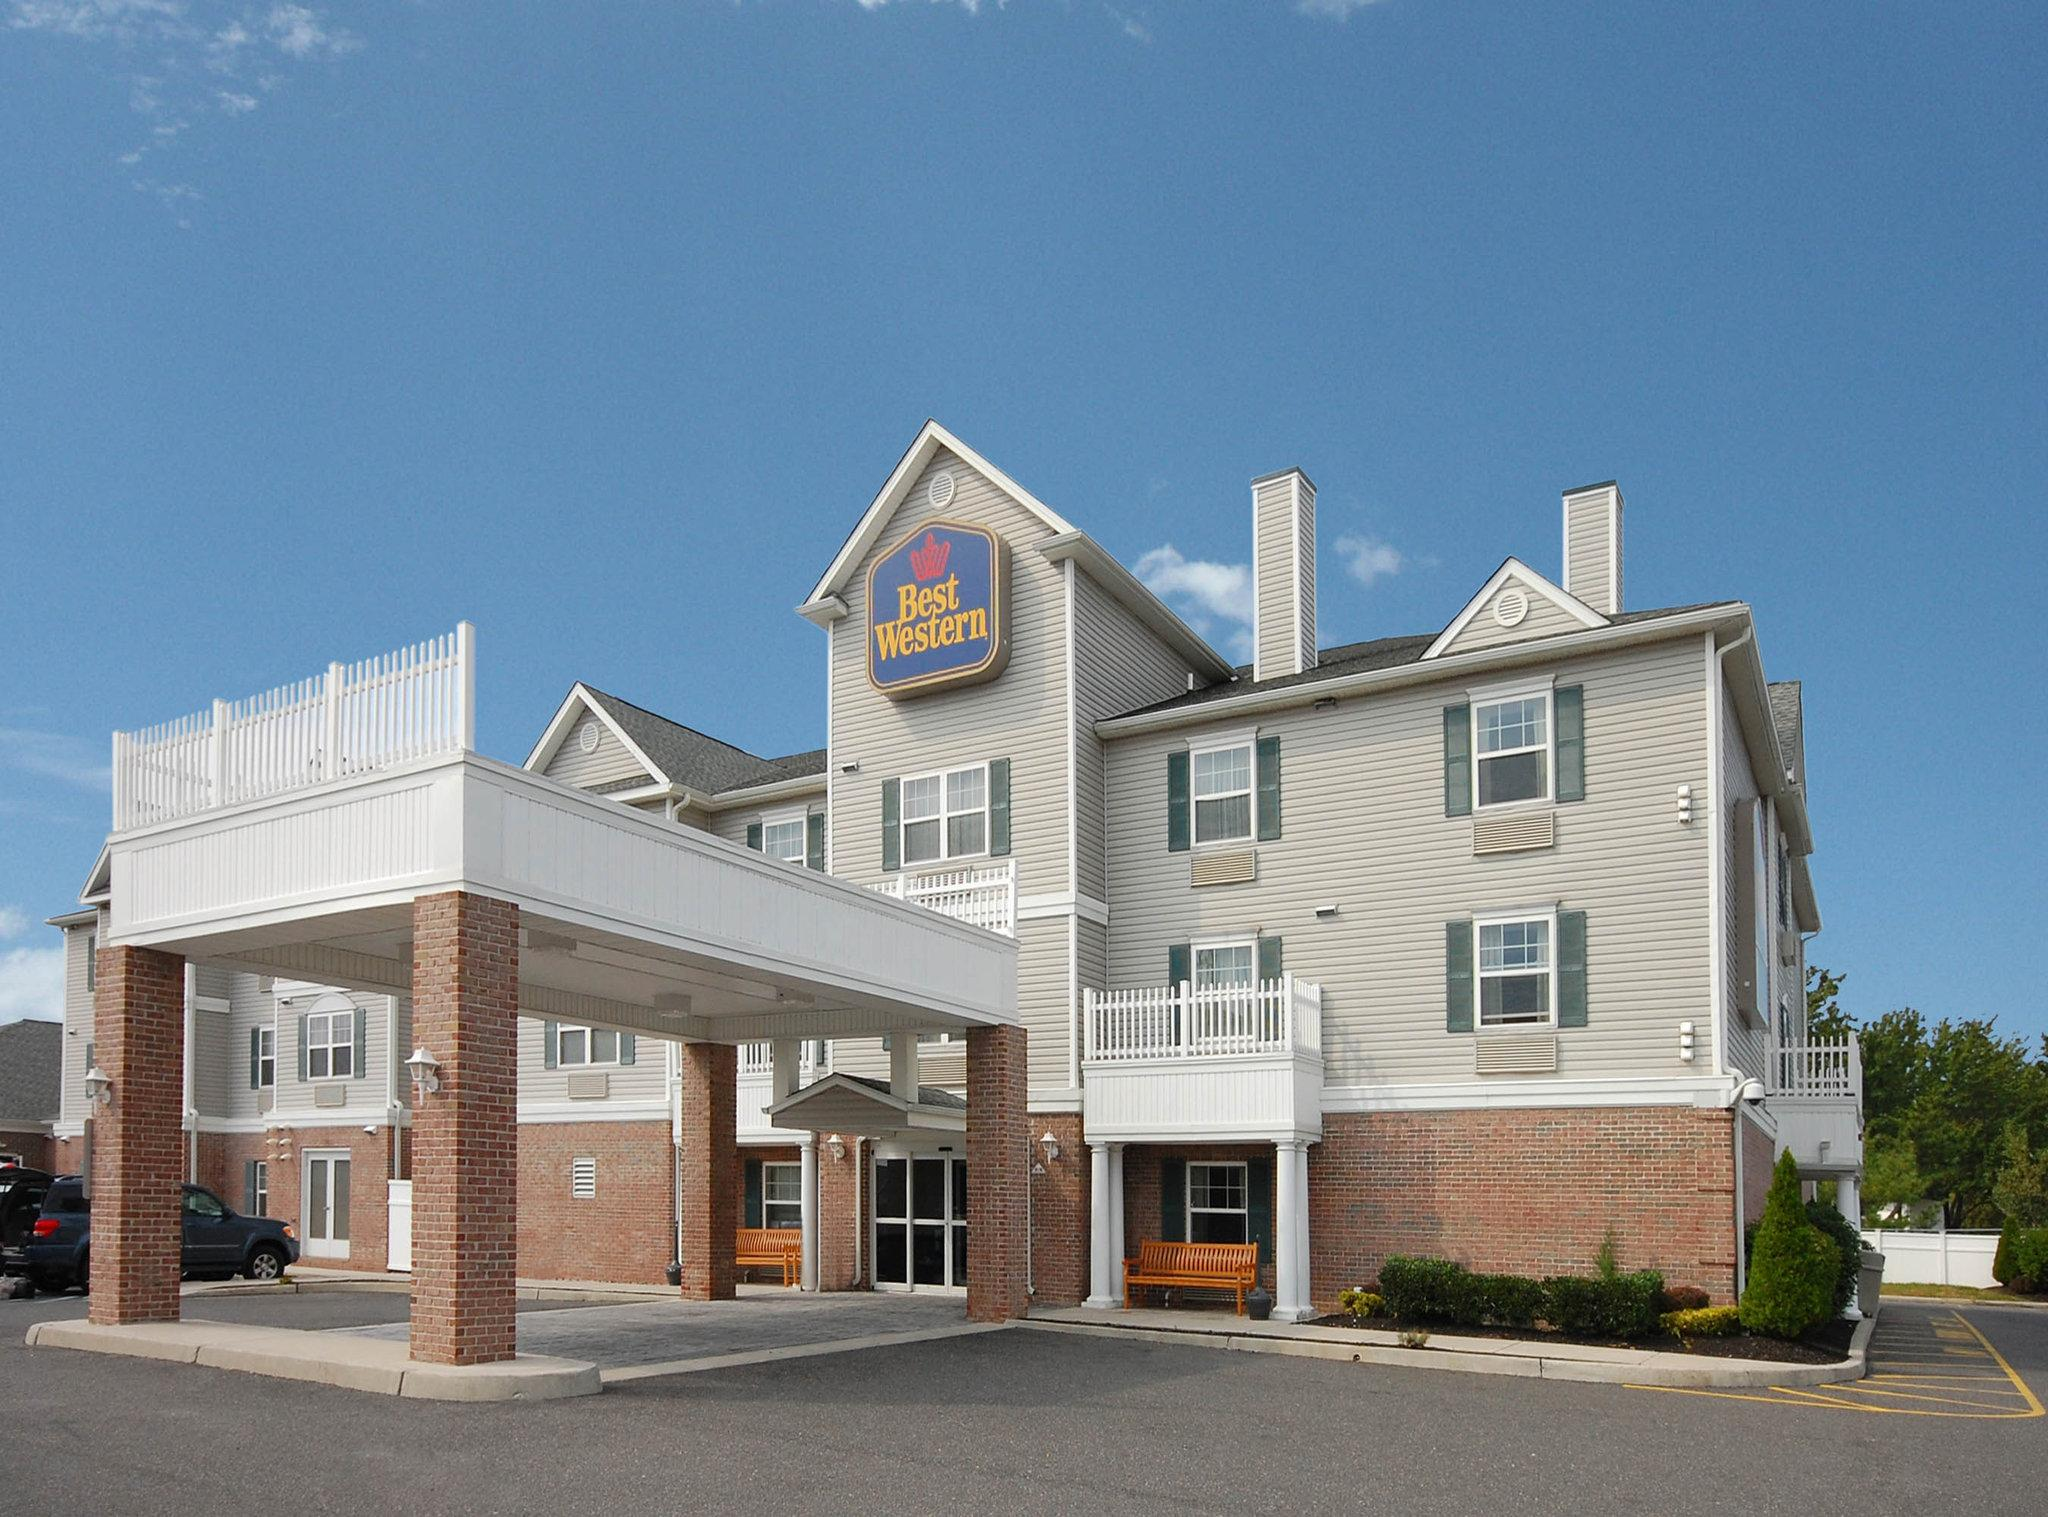 BEST WESTERN PLUS Atlantic City West Extended Stay & Suites